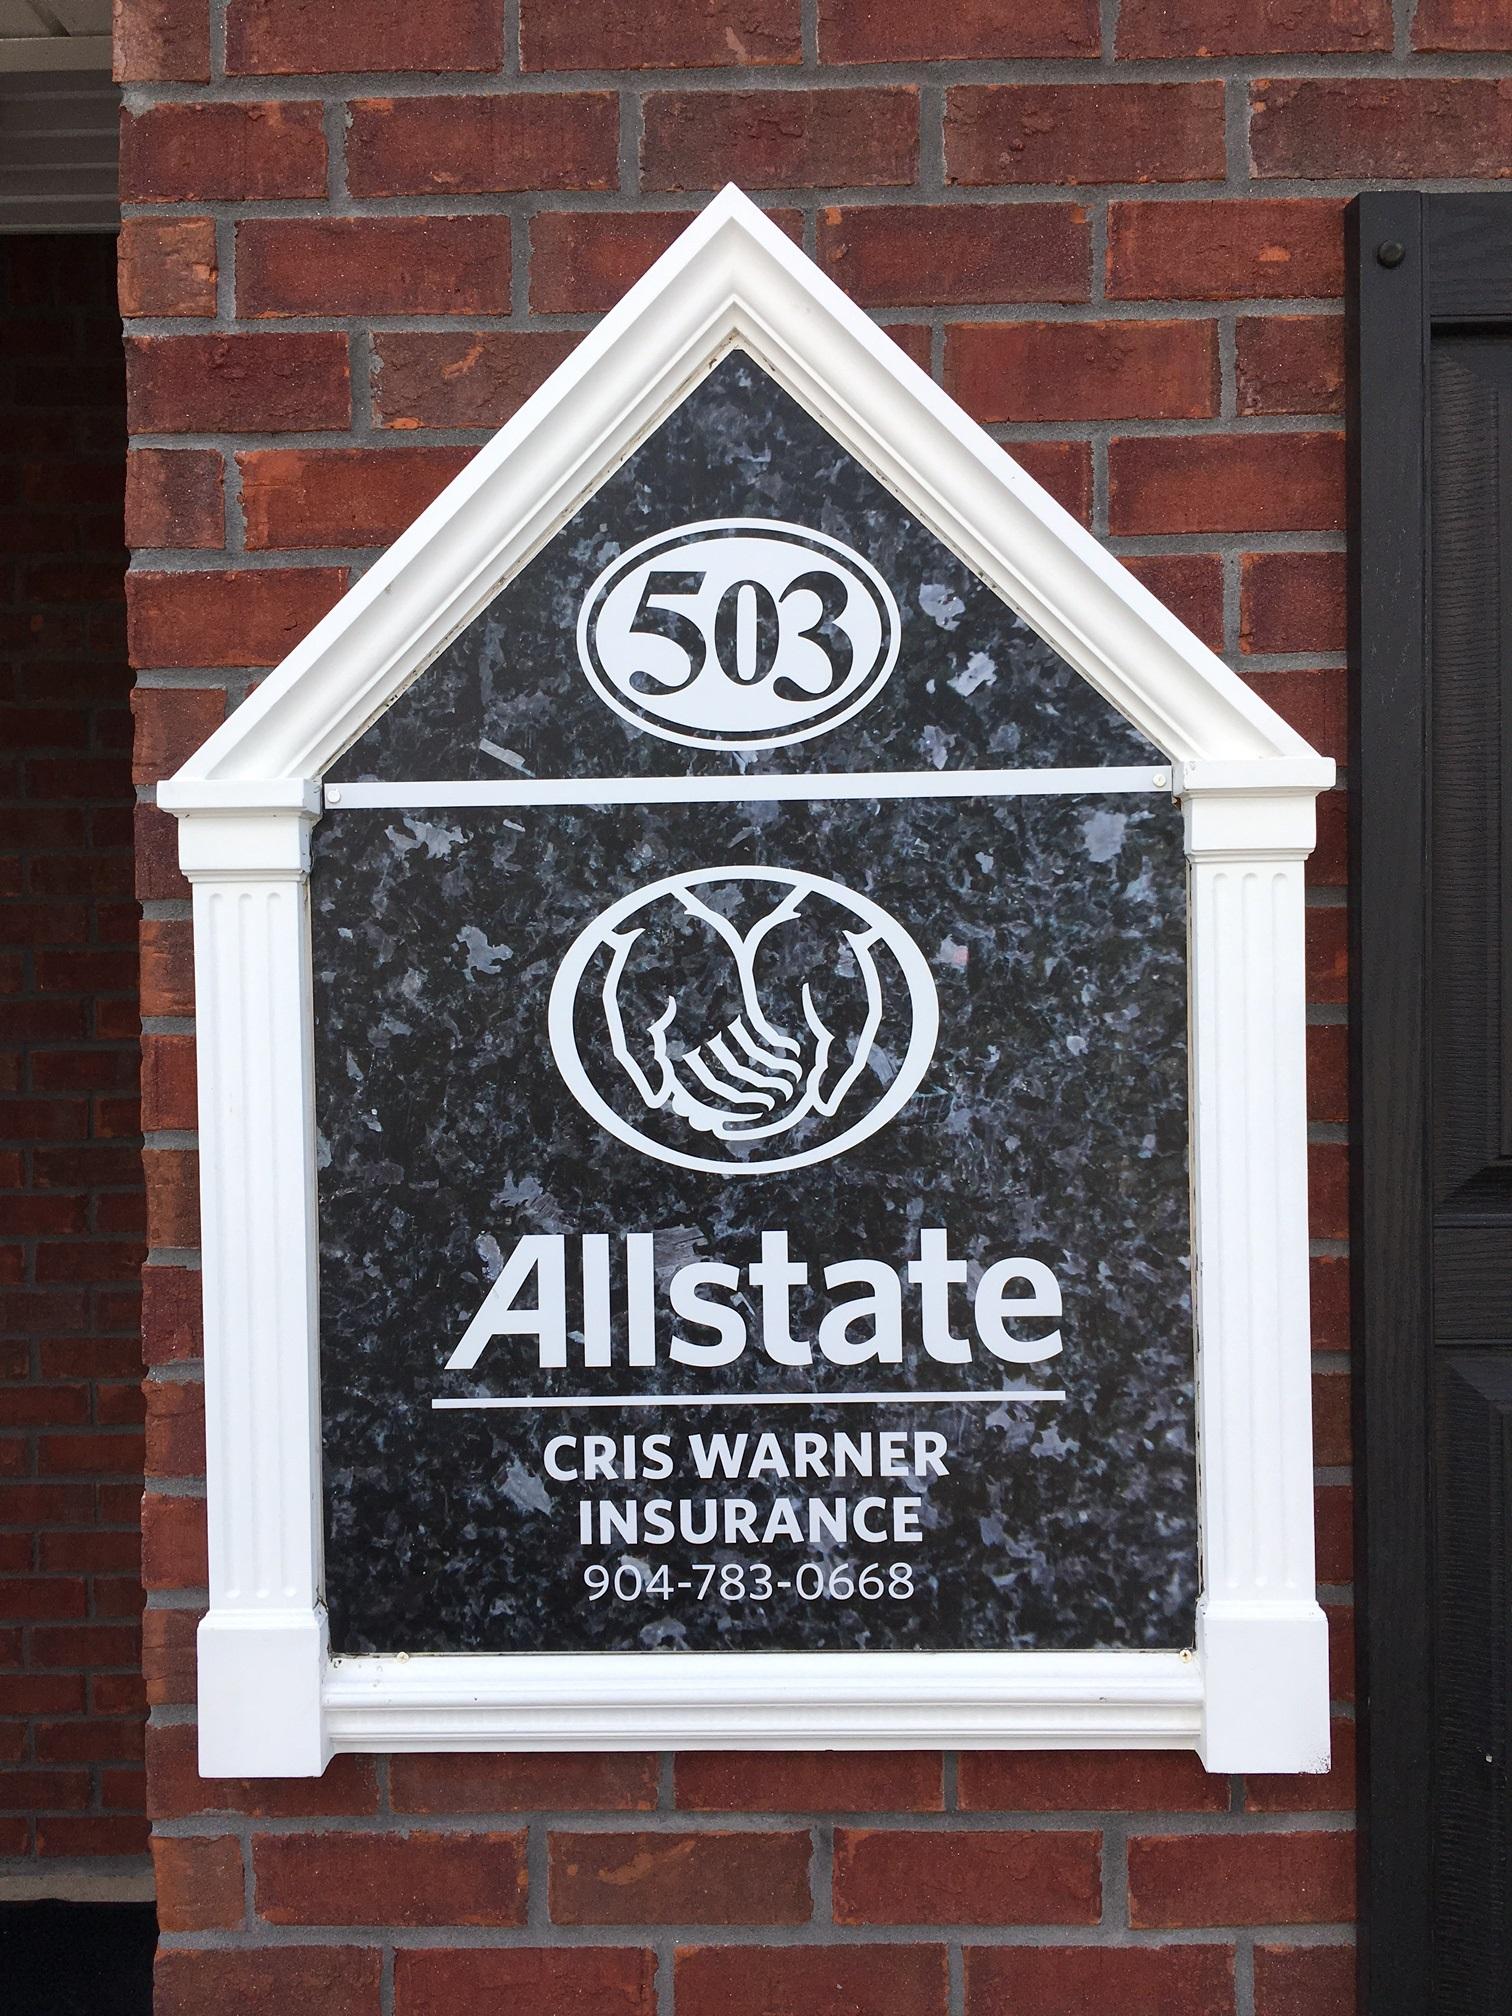 Allstate Insurance Agent: Cris Warner image 4